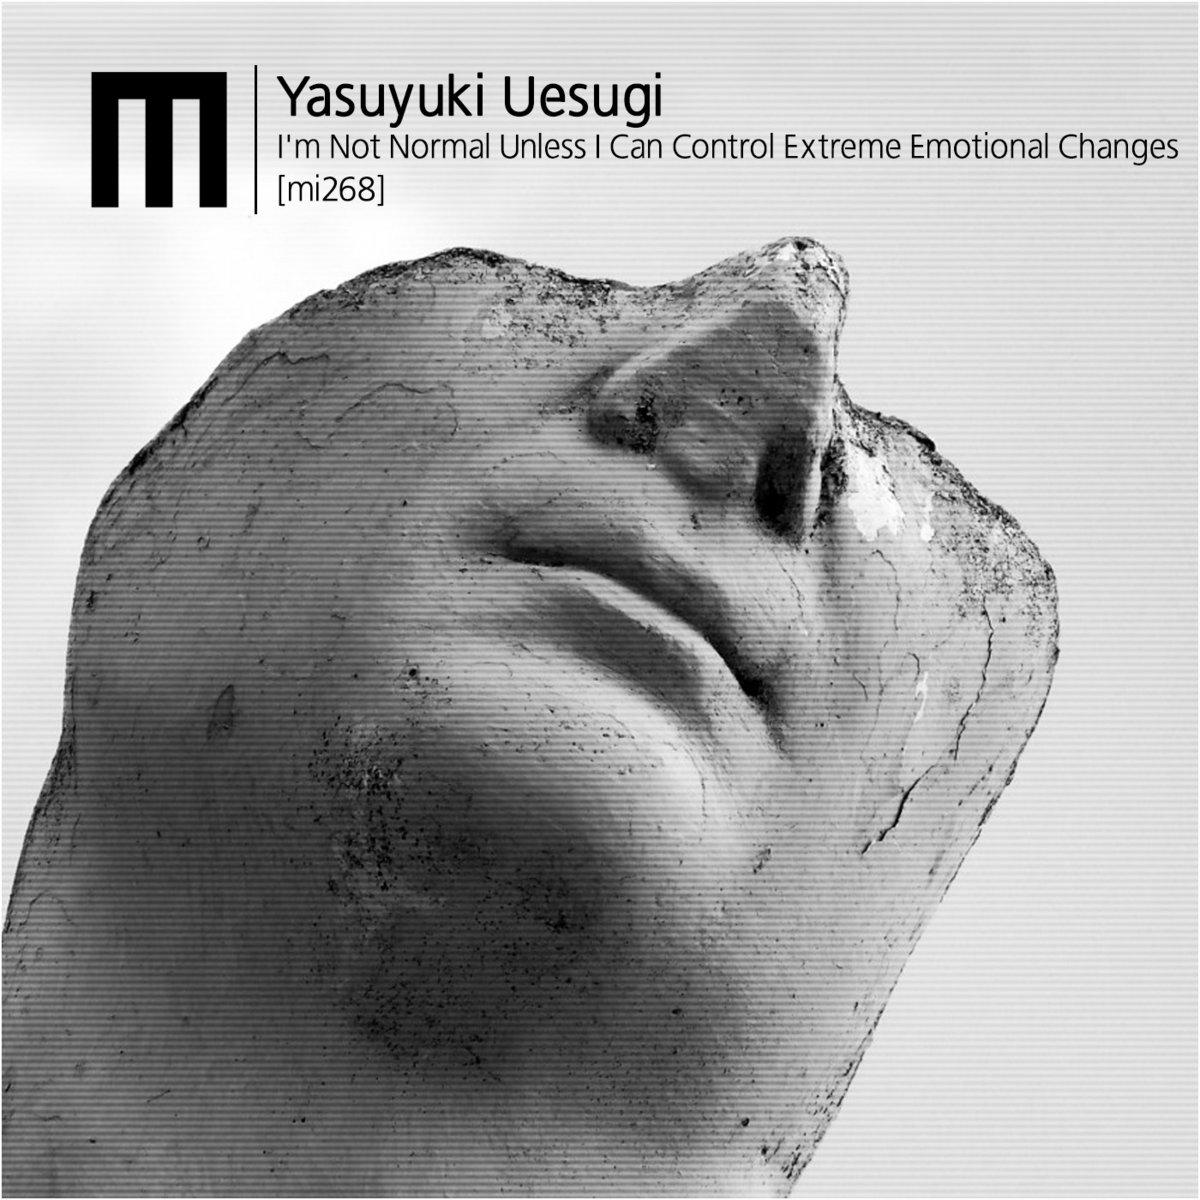 Yasuyuki Uesugi – I'm Not Normal Unless I Can Control Extreme Emotional Changes